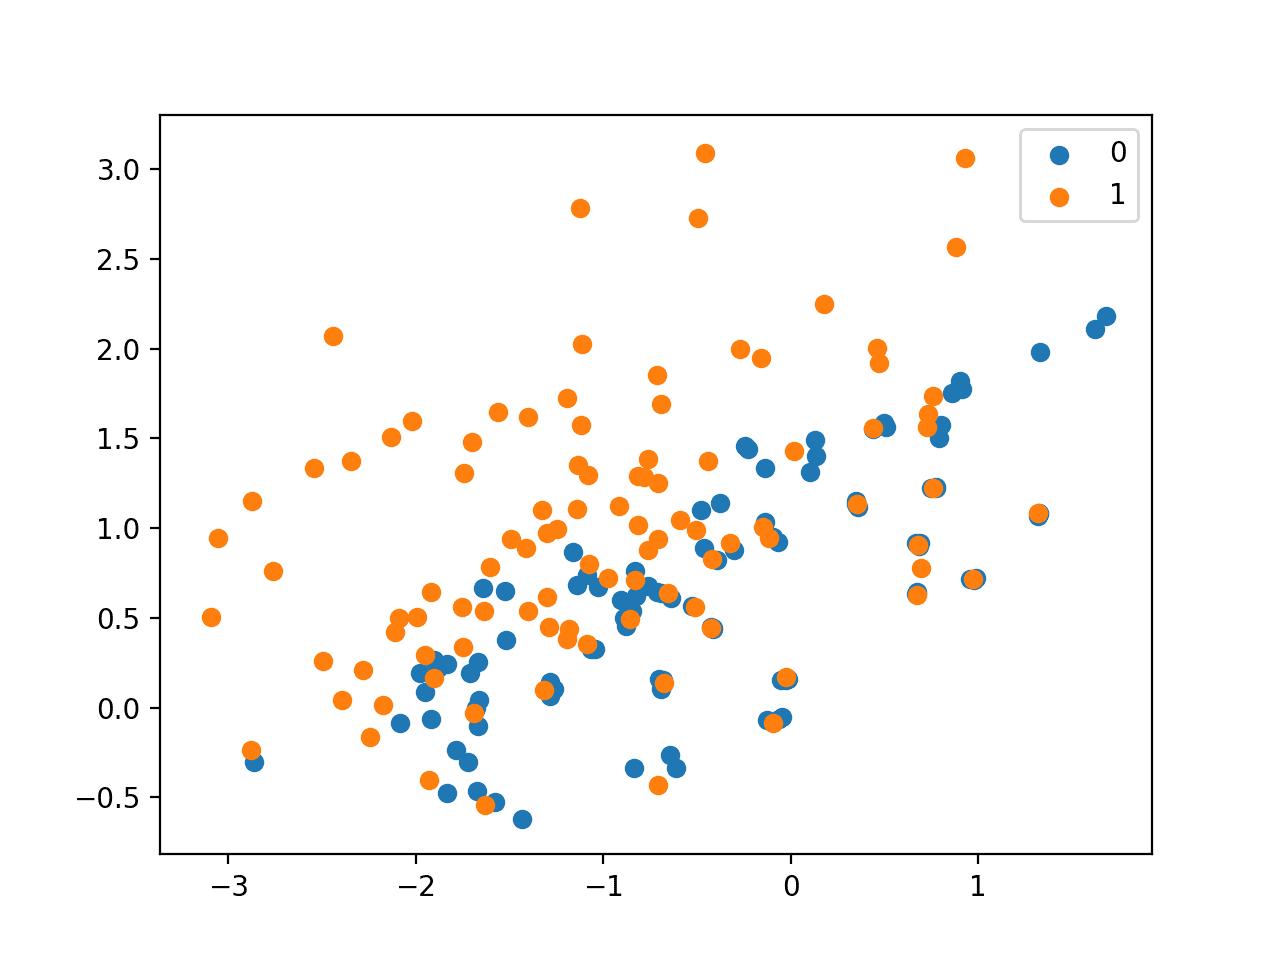 Scatter Plot of Imbalanced Dataset Undersampled With NearMiss-3